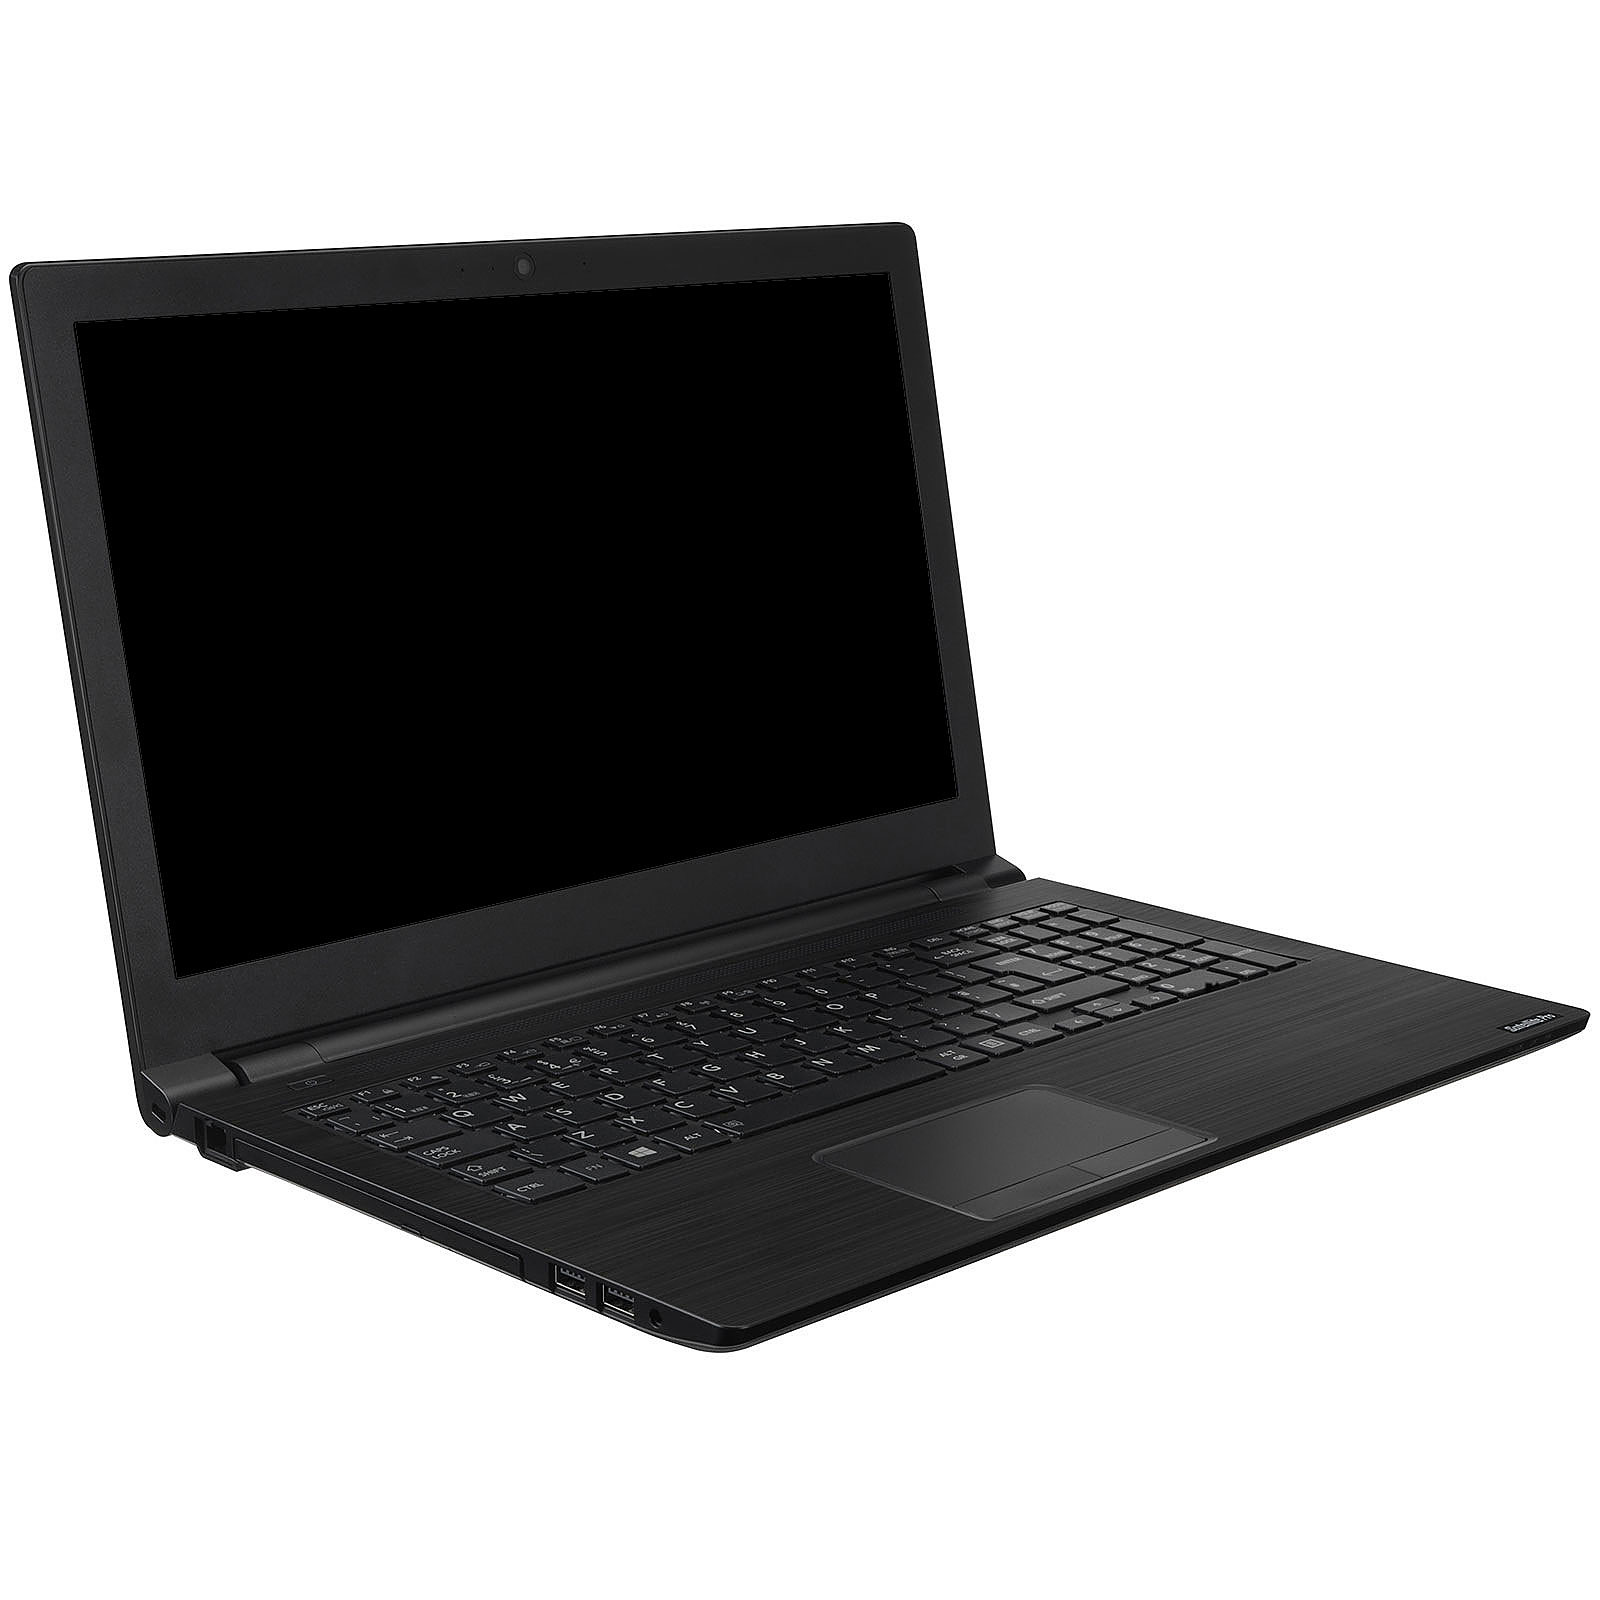 Toshiba / Dynabook Satellite Pro R50-E-1D7